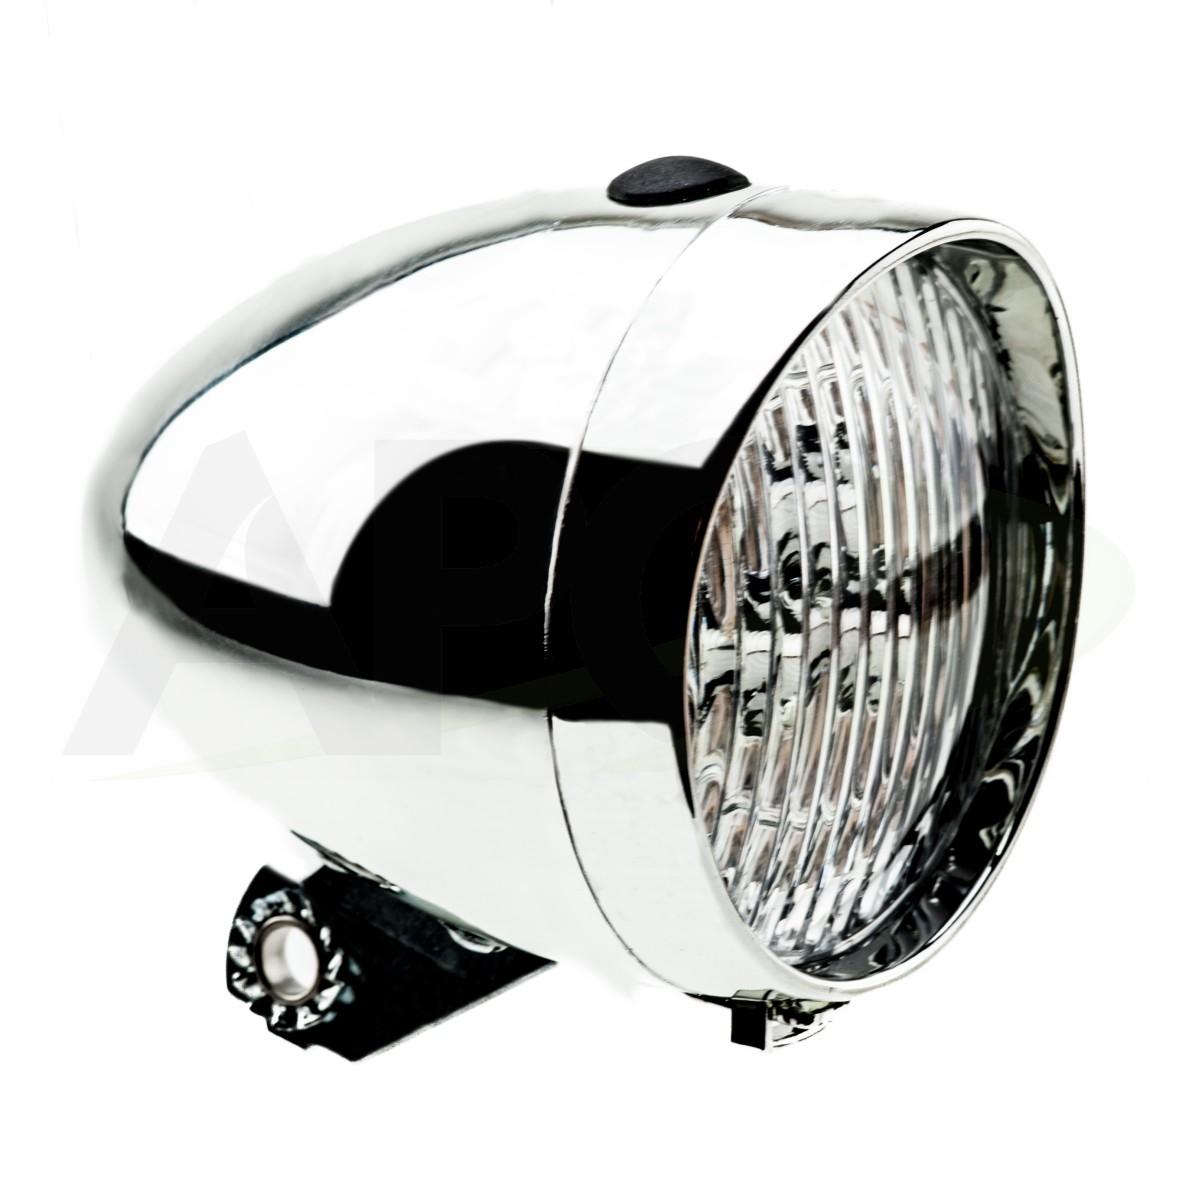 LAMPA BATERYJNA PRZÓD HW 160302 S srebrna